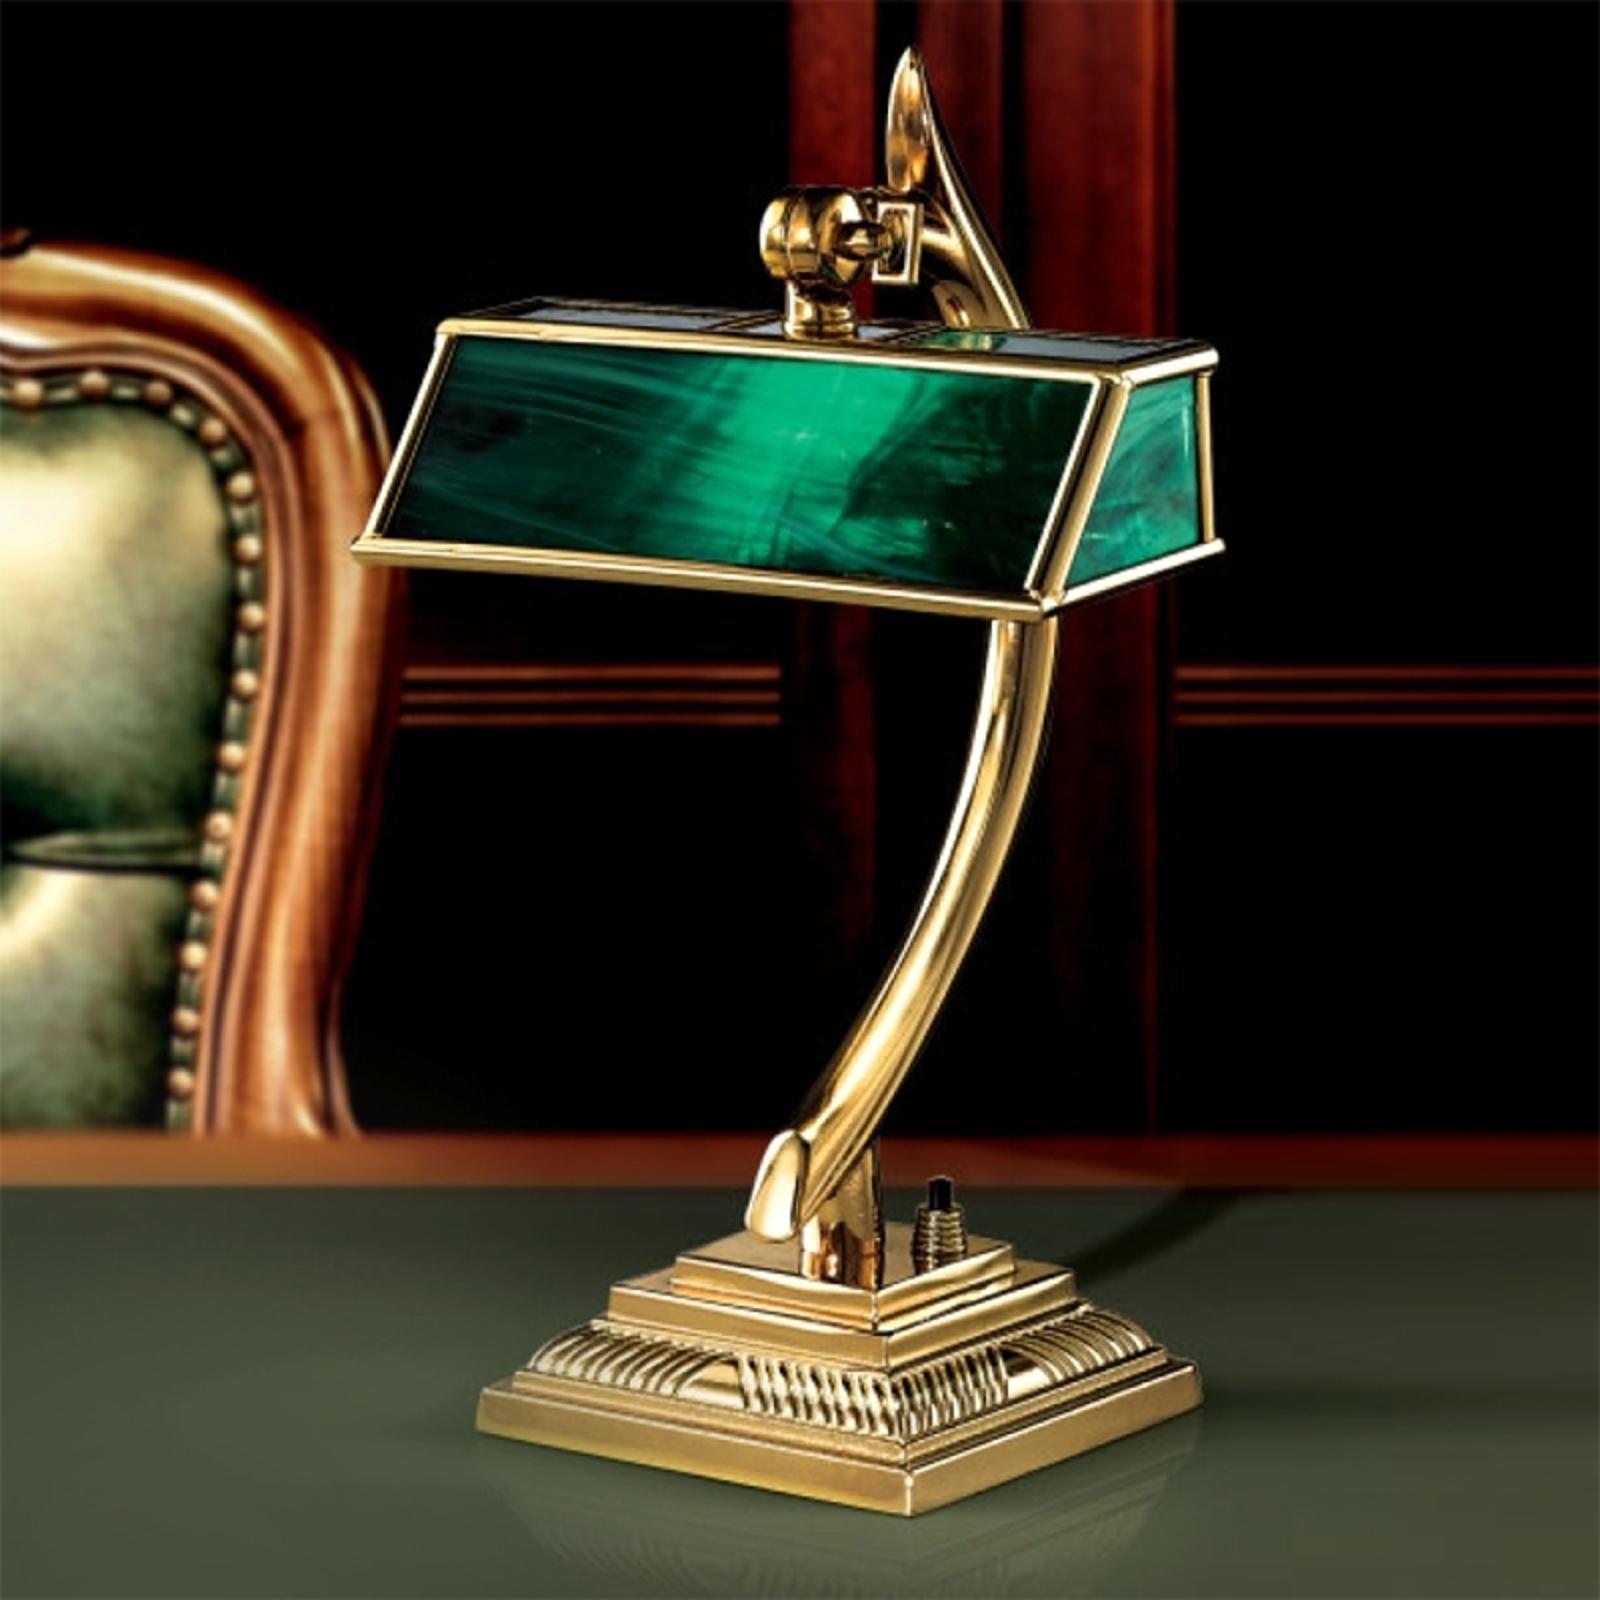 Distinguished Antiko table lamp_2008007_1